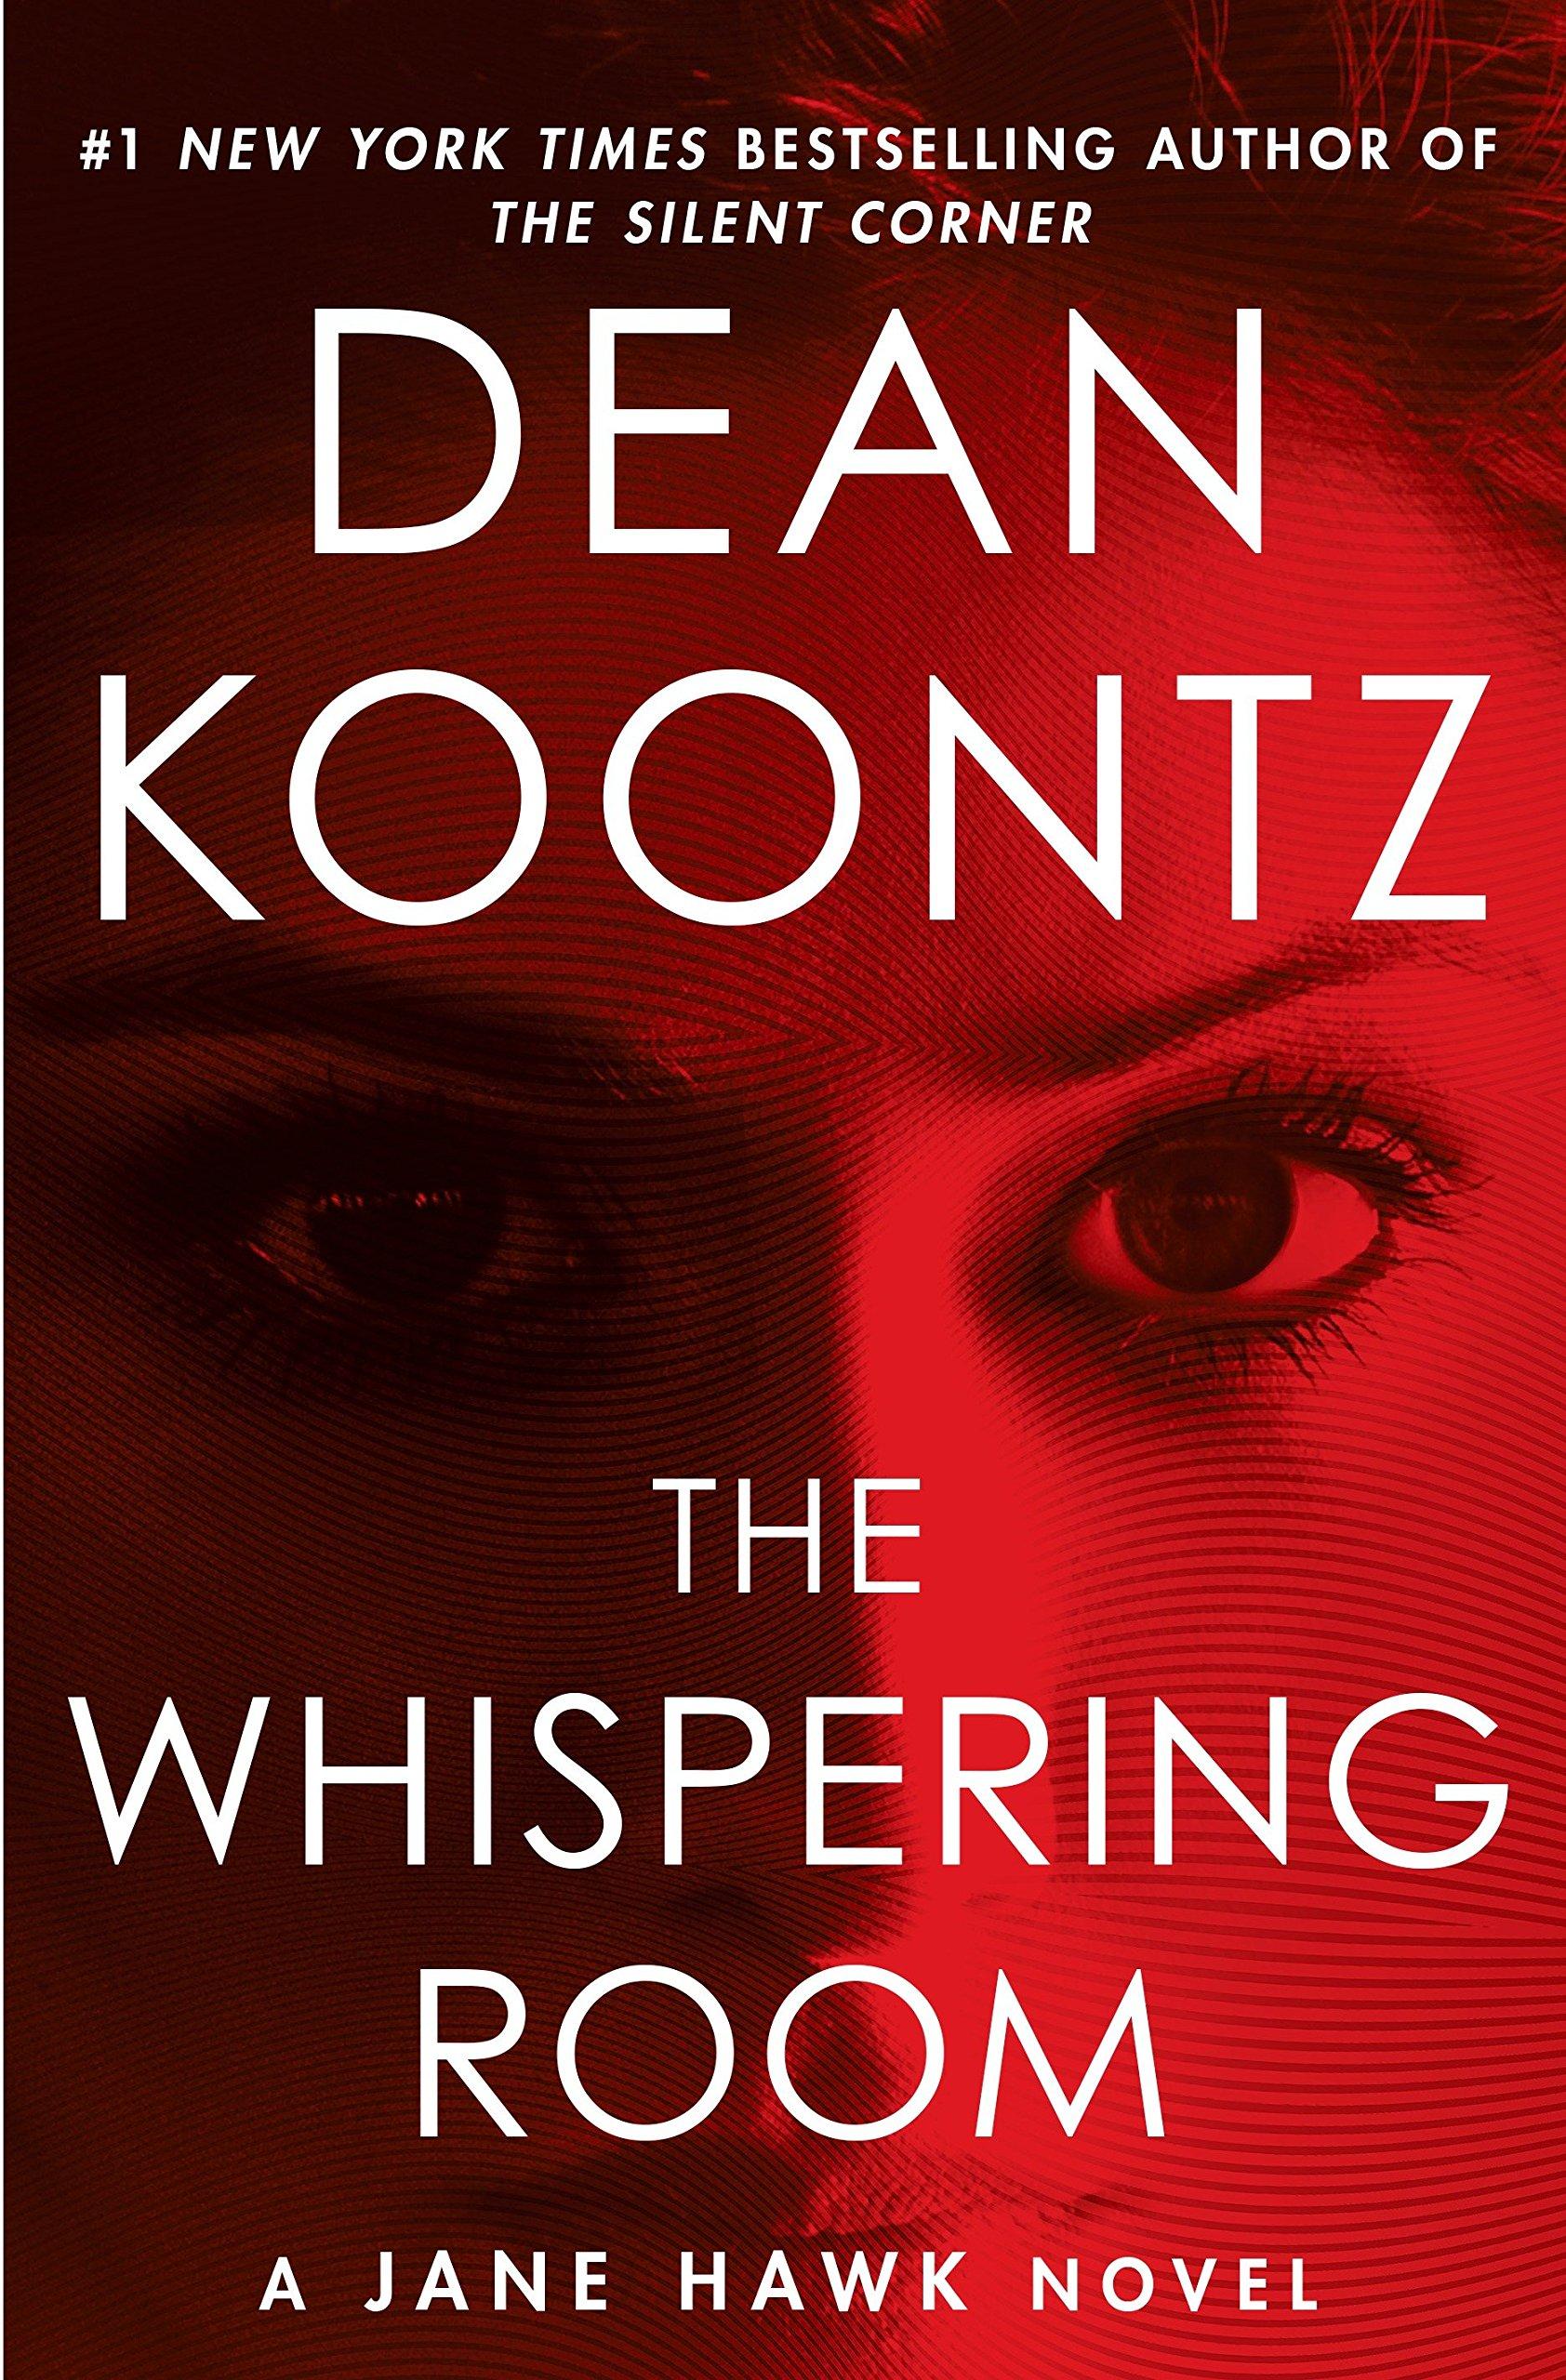 The Whispering Room: A Jane Hawk Novel ebook